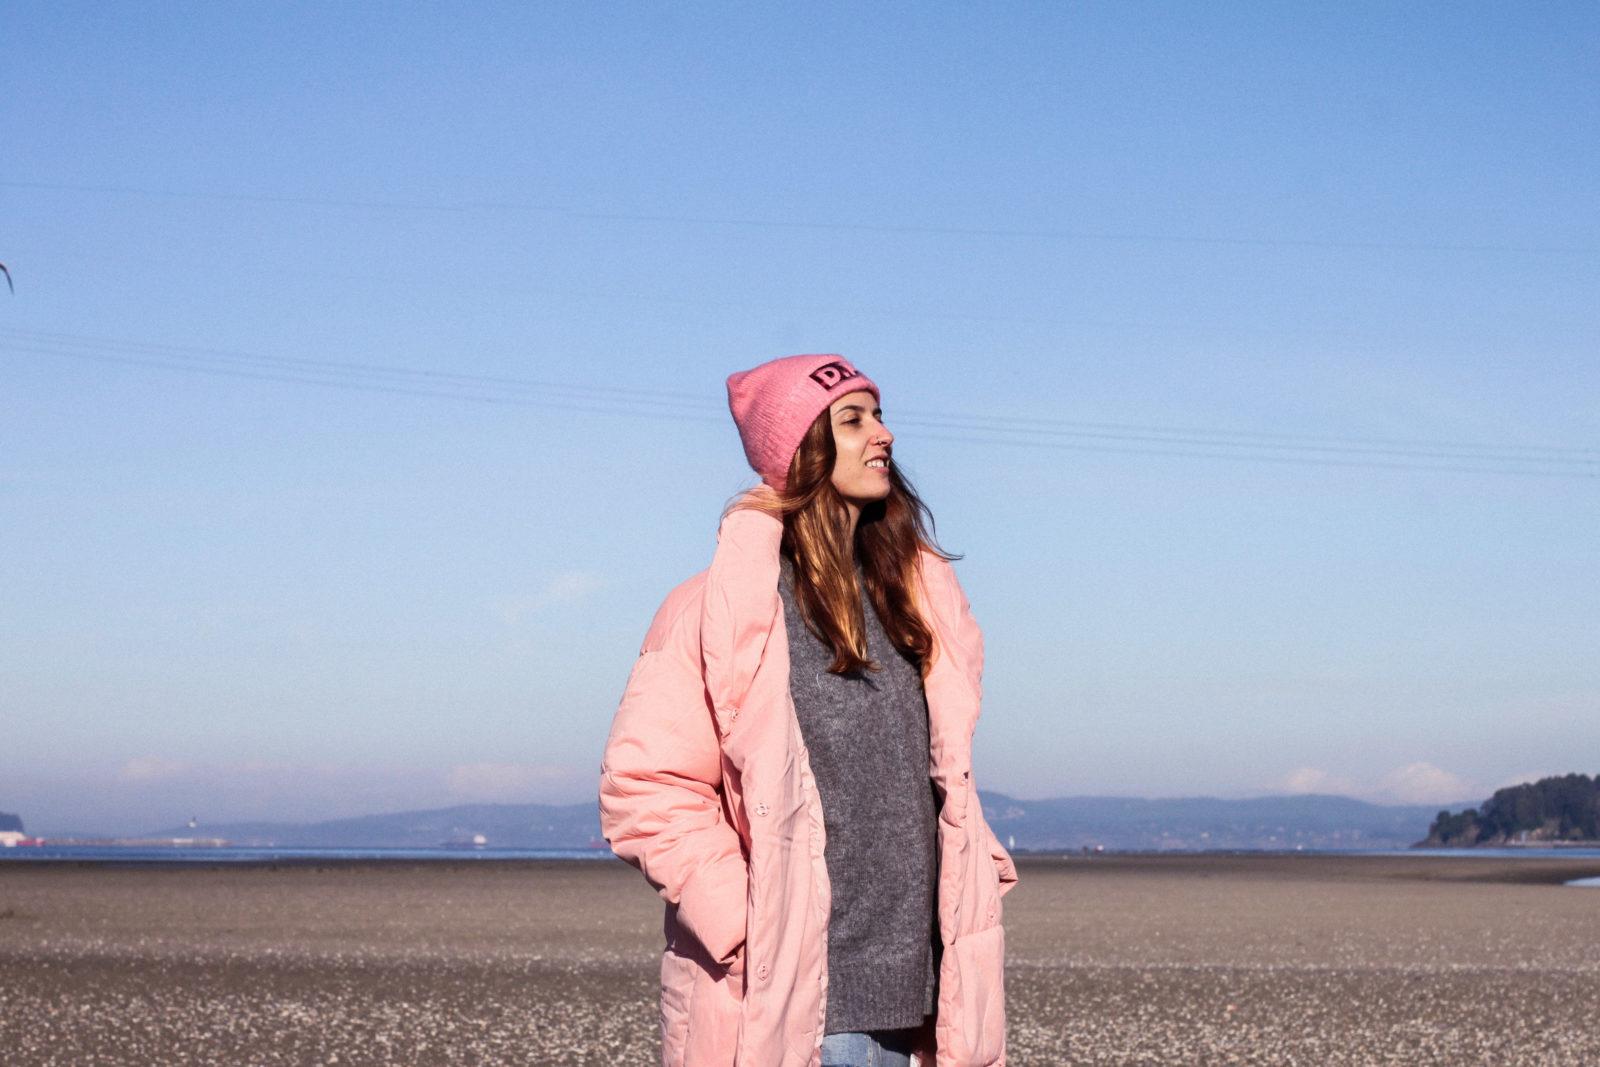 retailmenot-cupones-descuentos-asos-plumifero_rosa-monki-puffer_coat-gorro-beanie-medias_de_rejilla-look-outfit-tendencias-fall-2016-street_style-donkeycool-22